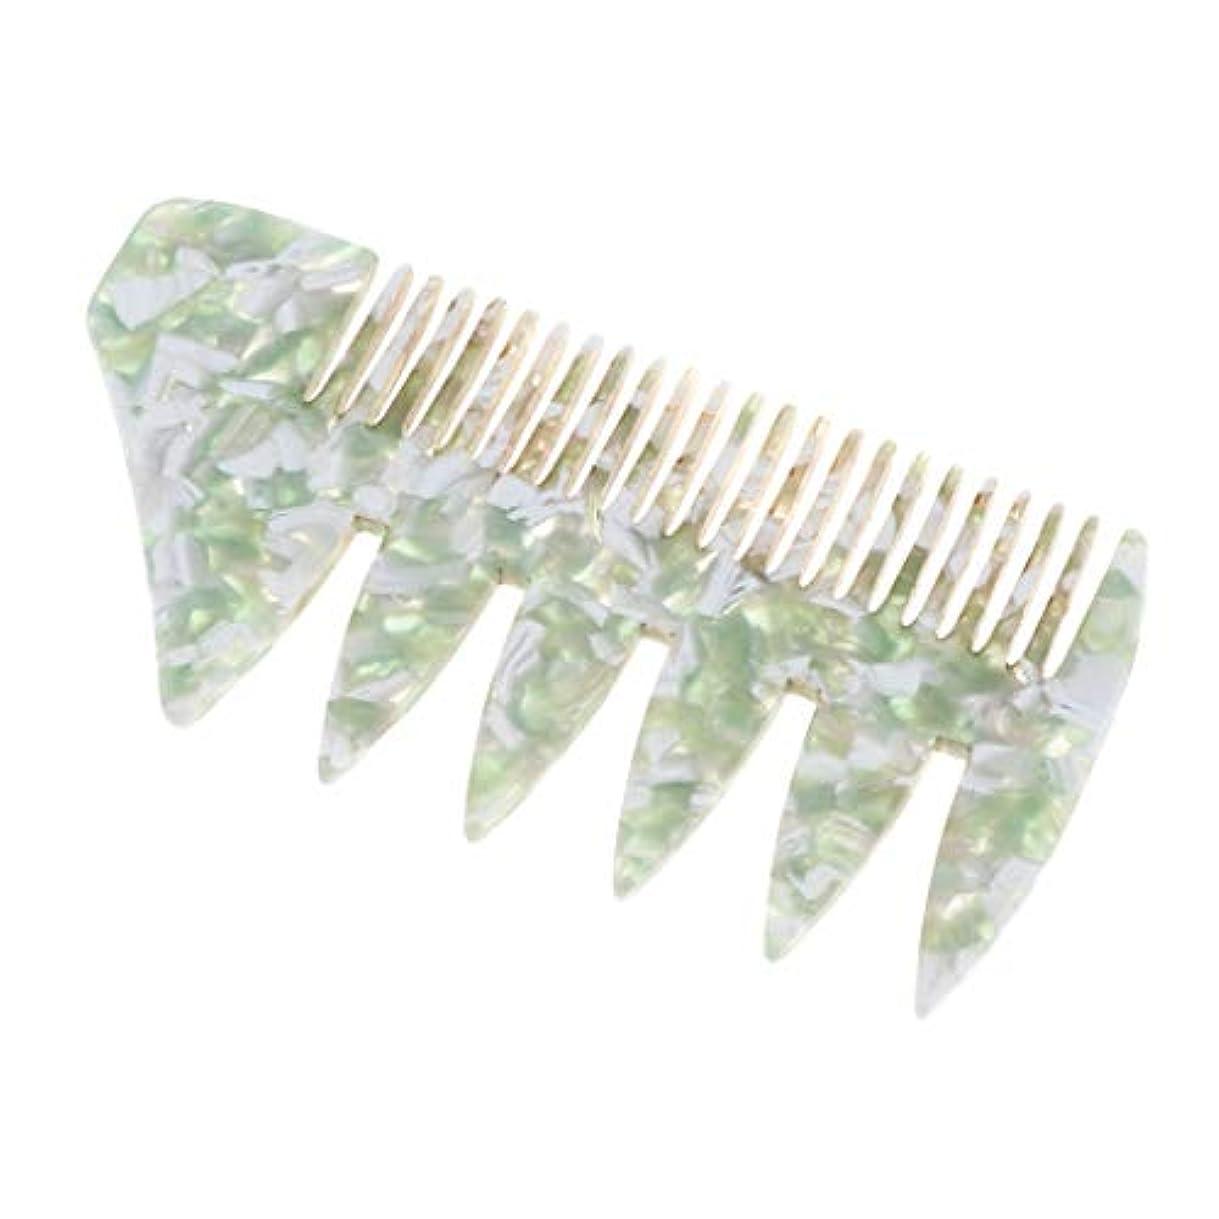 SM SunniMix プラスチック 広い歯 ヘアスタイリング櫛 くし 全4色 - 緑